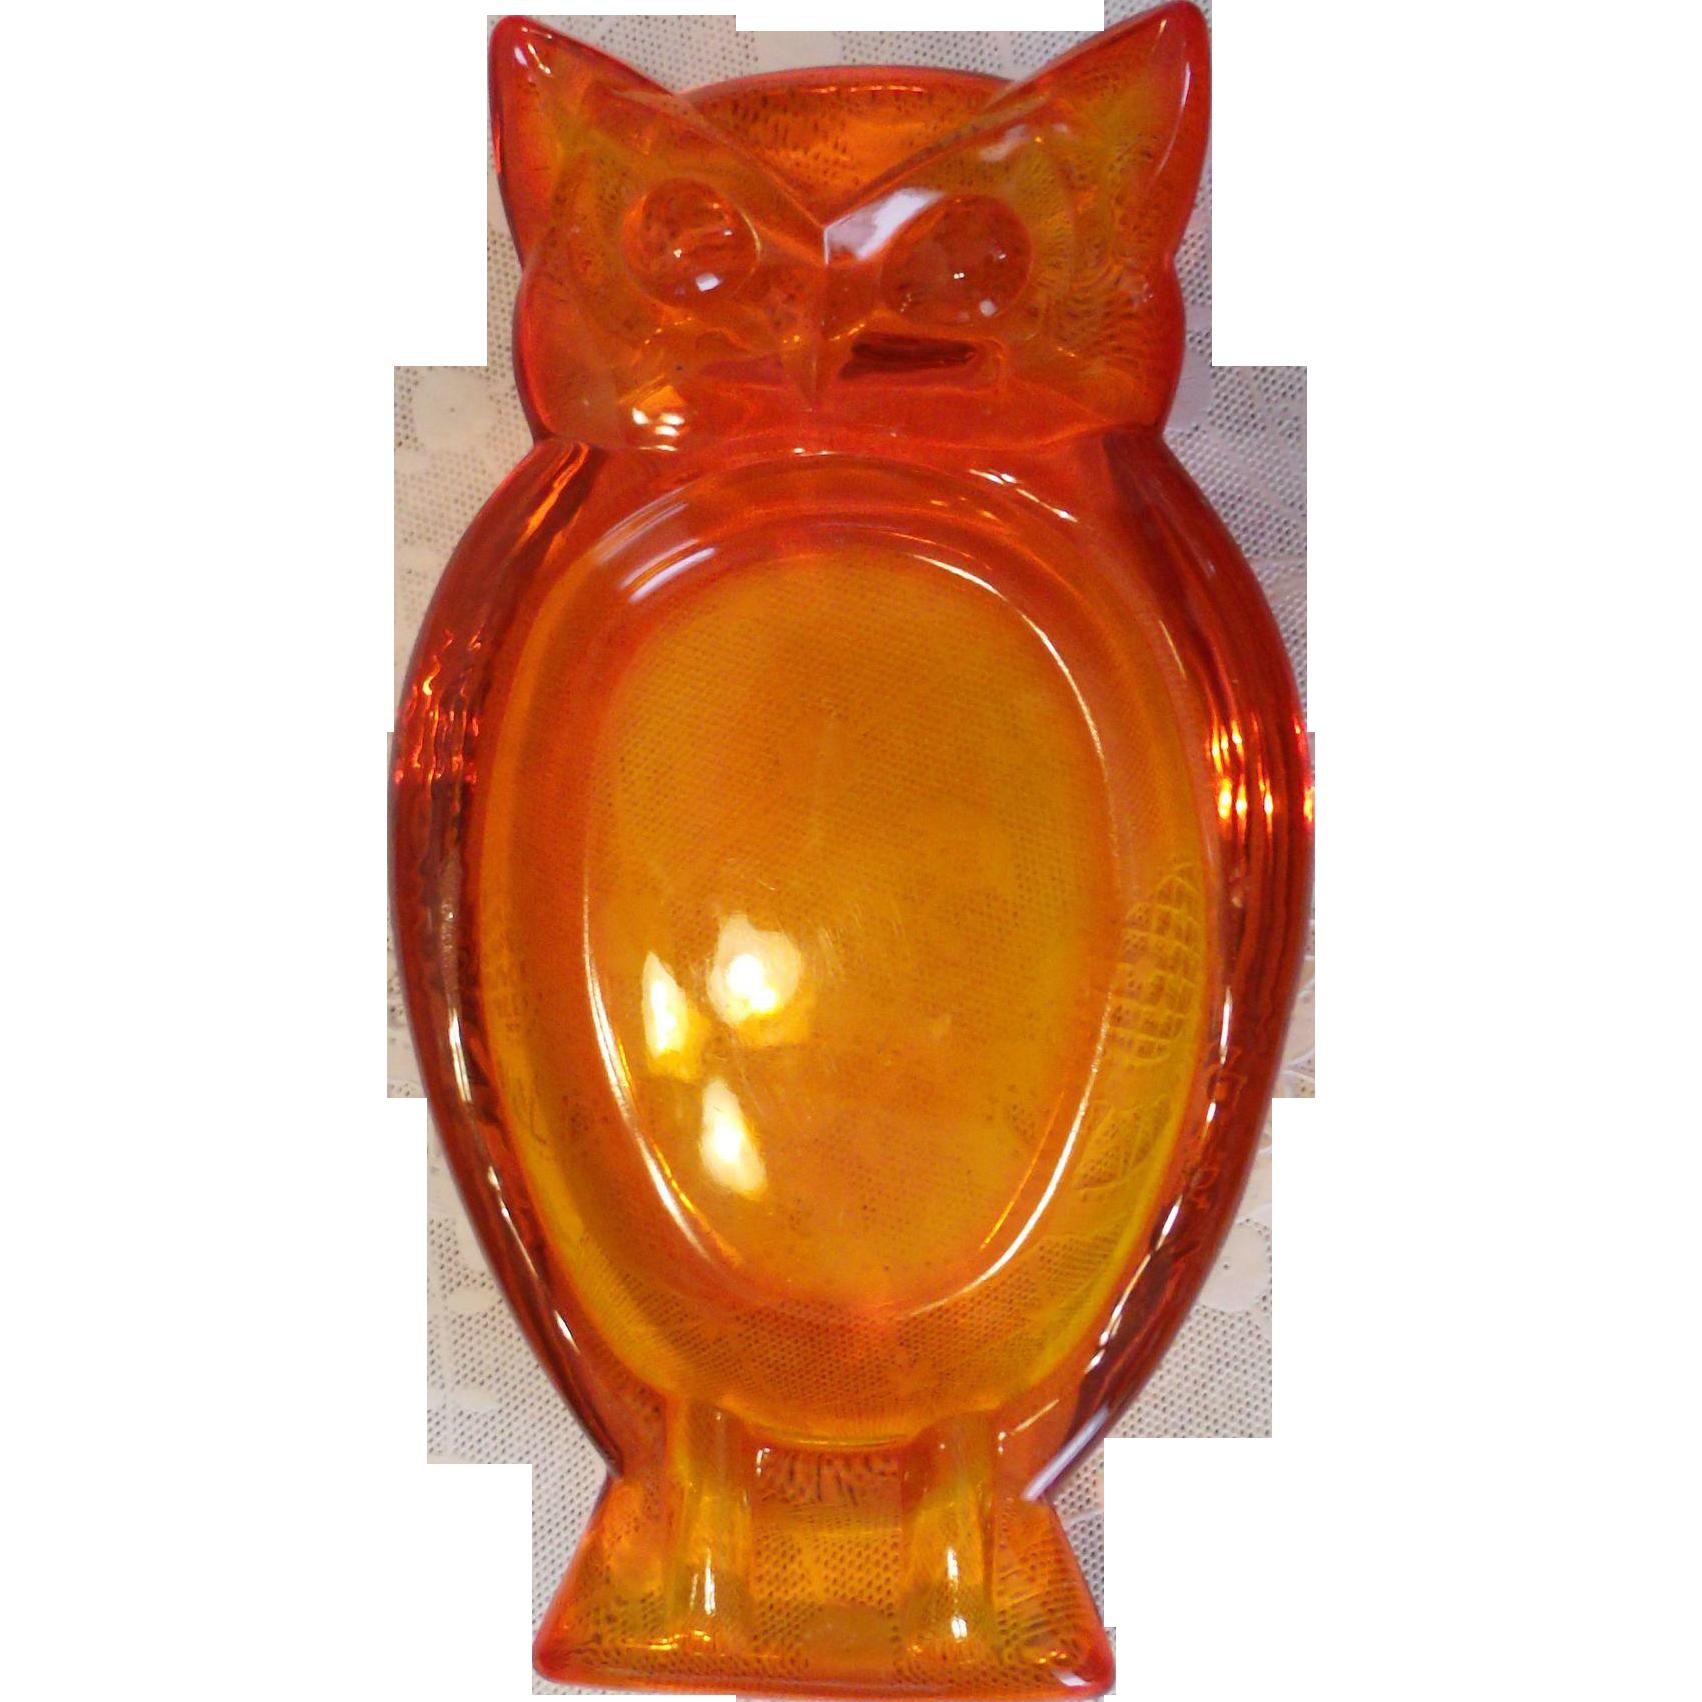 Orange / Persimmon / Amberina Viking Glass OWL Ashtray Retro Groovy